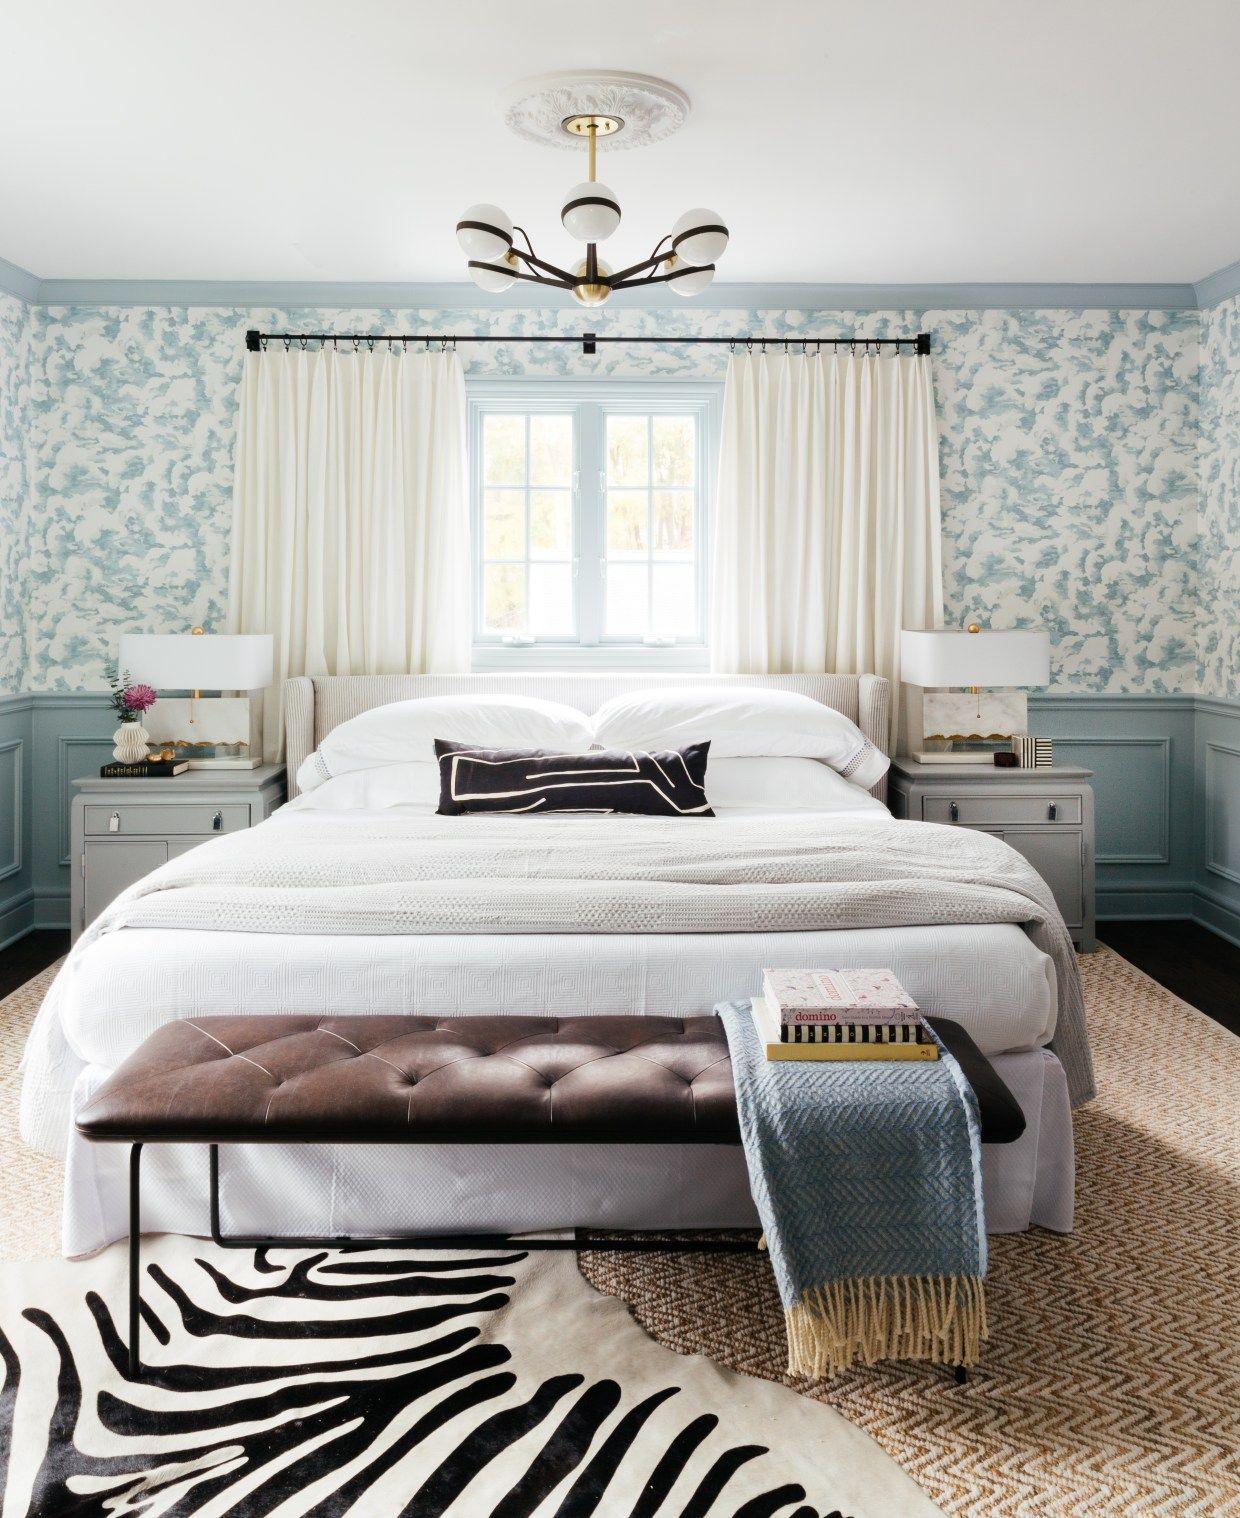 Top 60 Best Master Bedroom Ideas: Stunningly Beautiful Master Bedroom With Lots Of Diy's